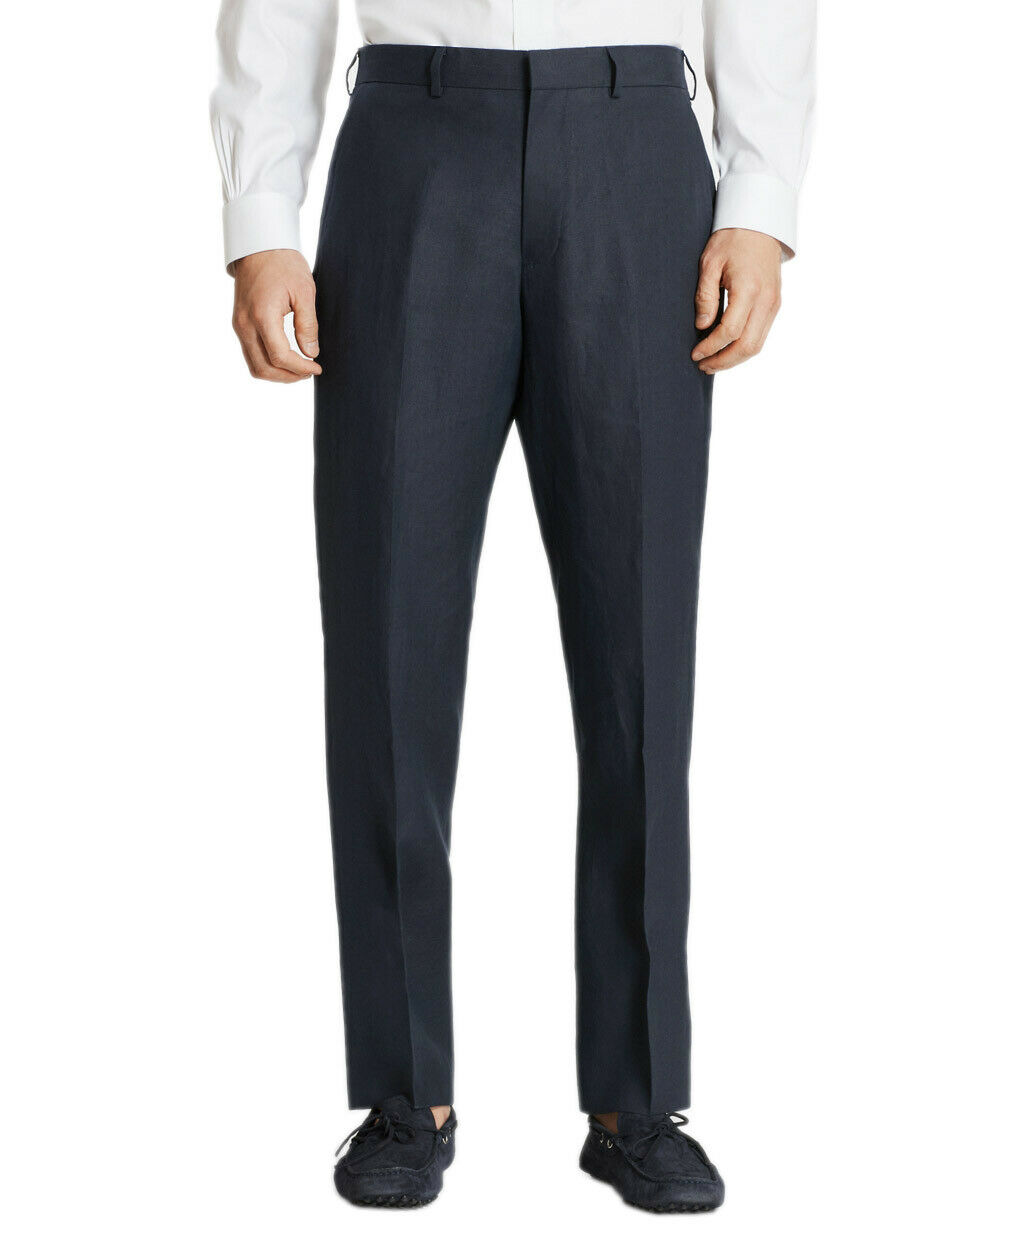 Brooks Bredhers Mens Navy bluee Regent Linen Flat Front Pants 38S Short 8606-3